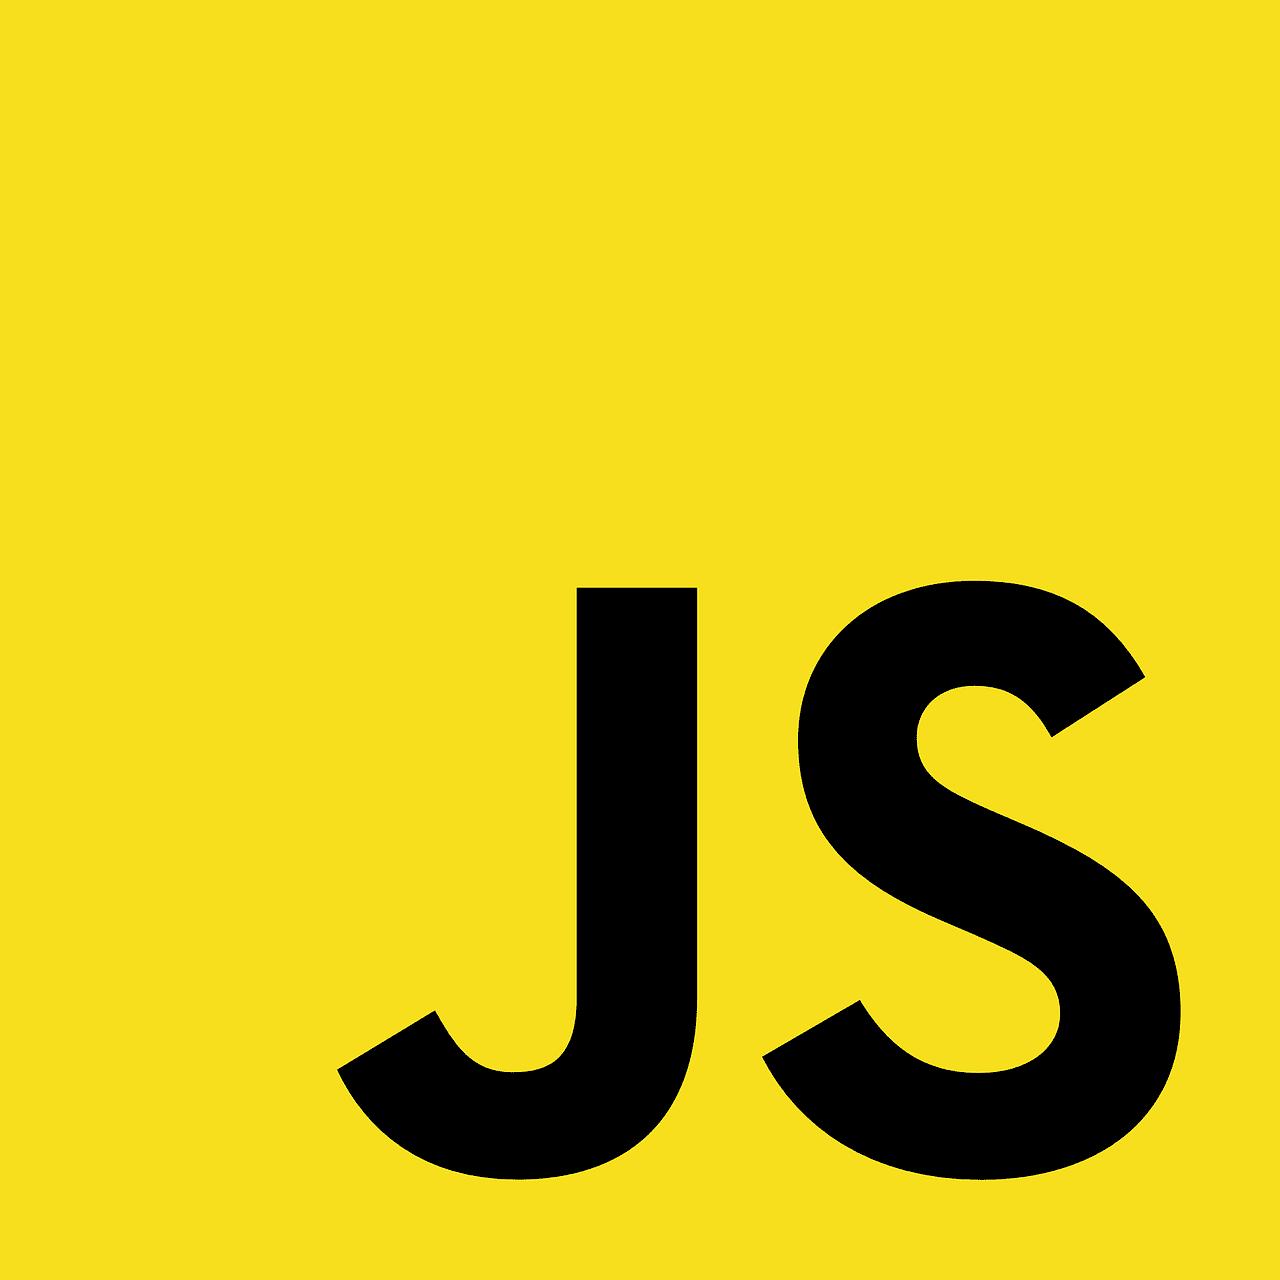 jaavscriptロゴ